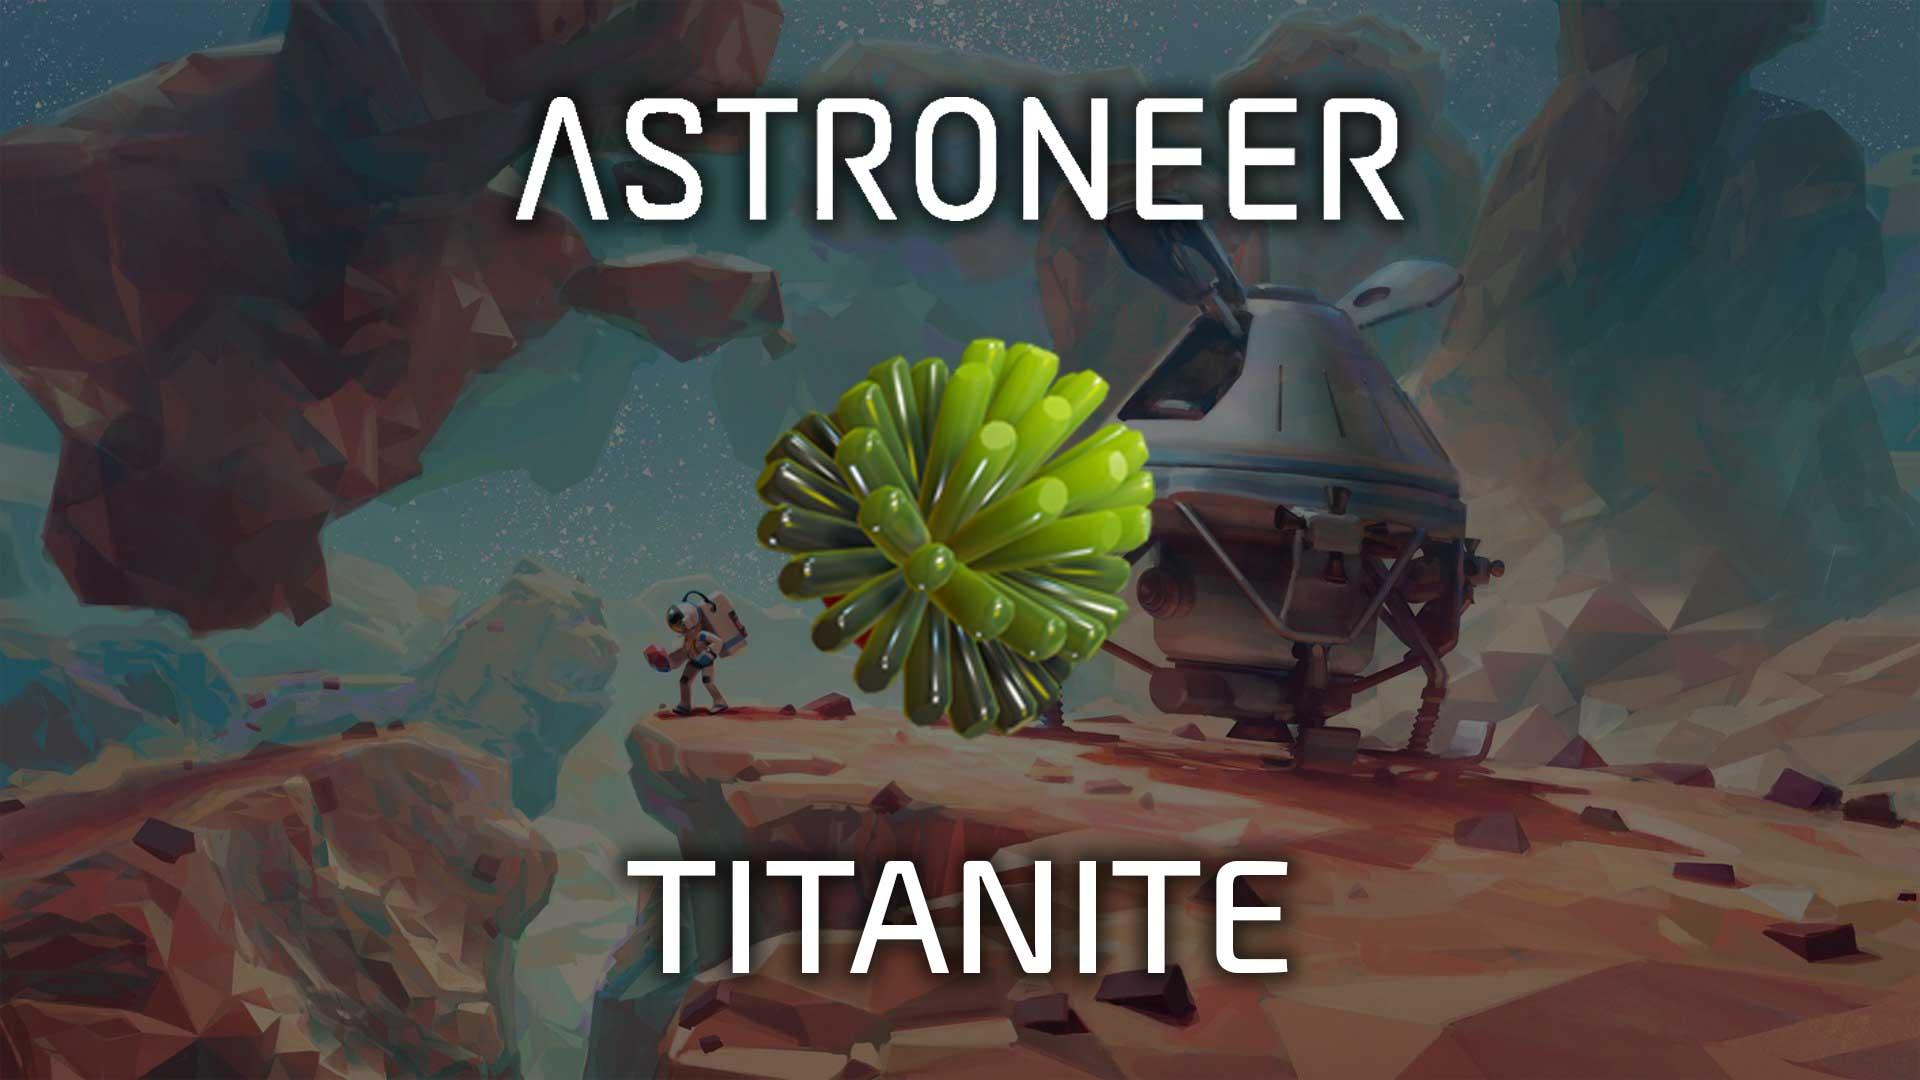 astroneer titanite